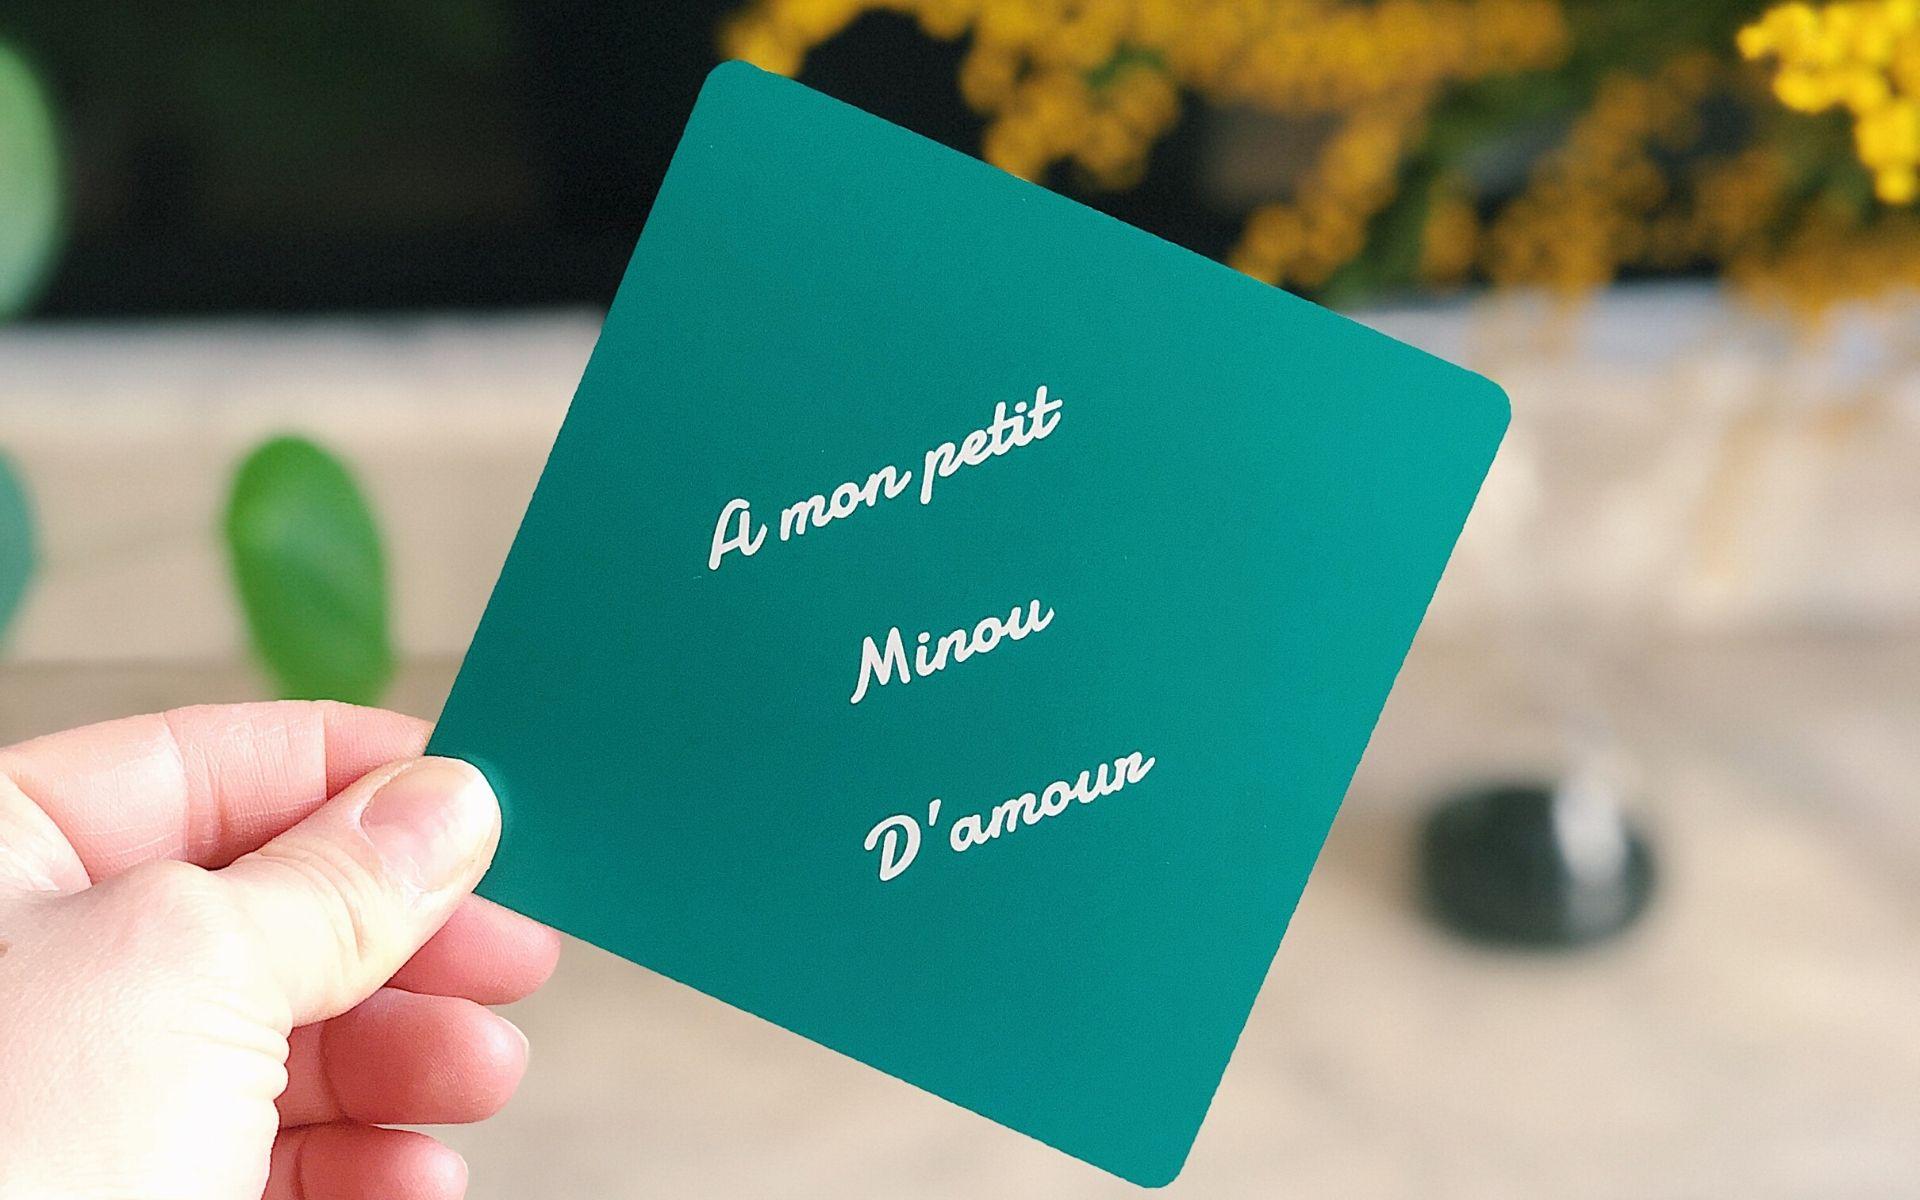 10 occasions d envoyer une carte personnalisee